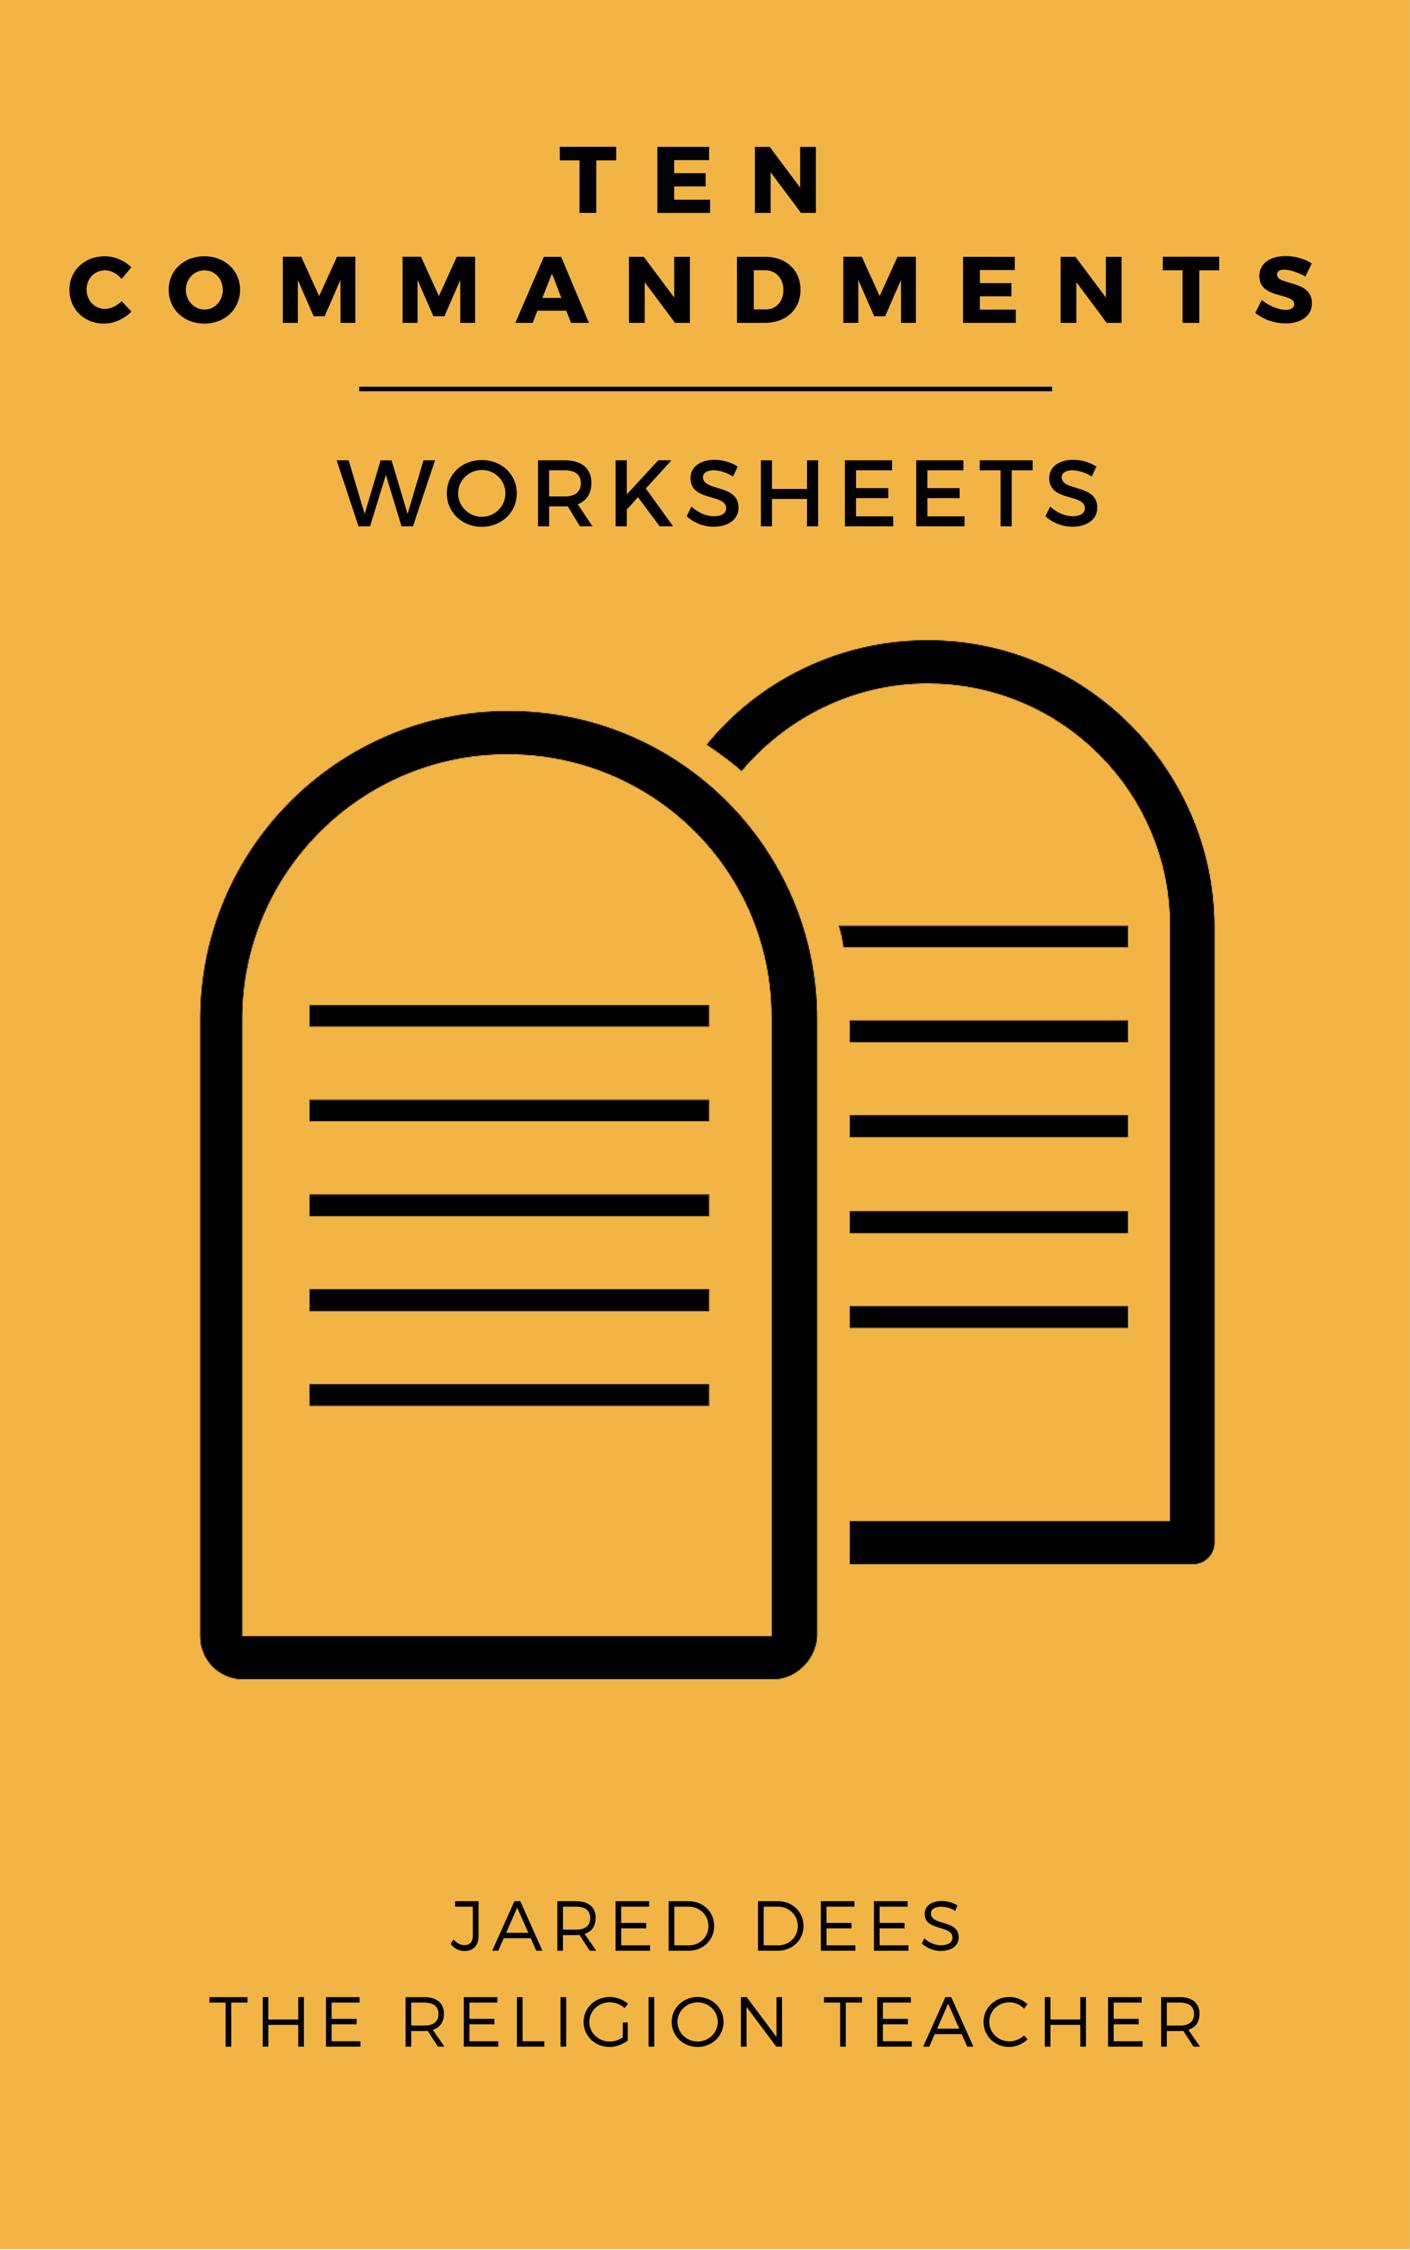 The Religion Teacher S Ten Commandments Worksheets